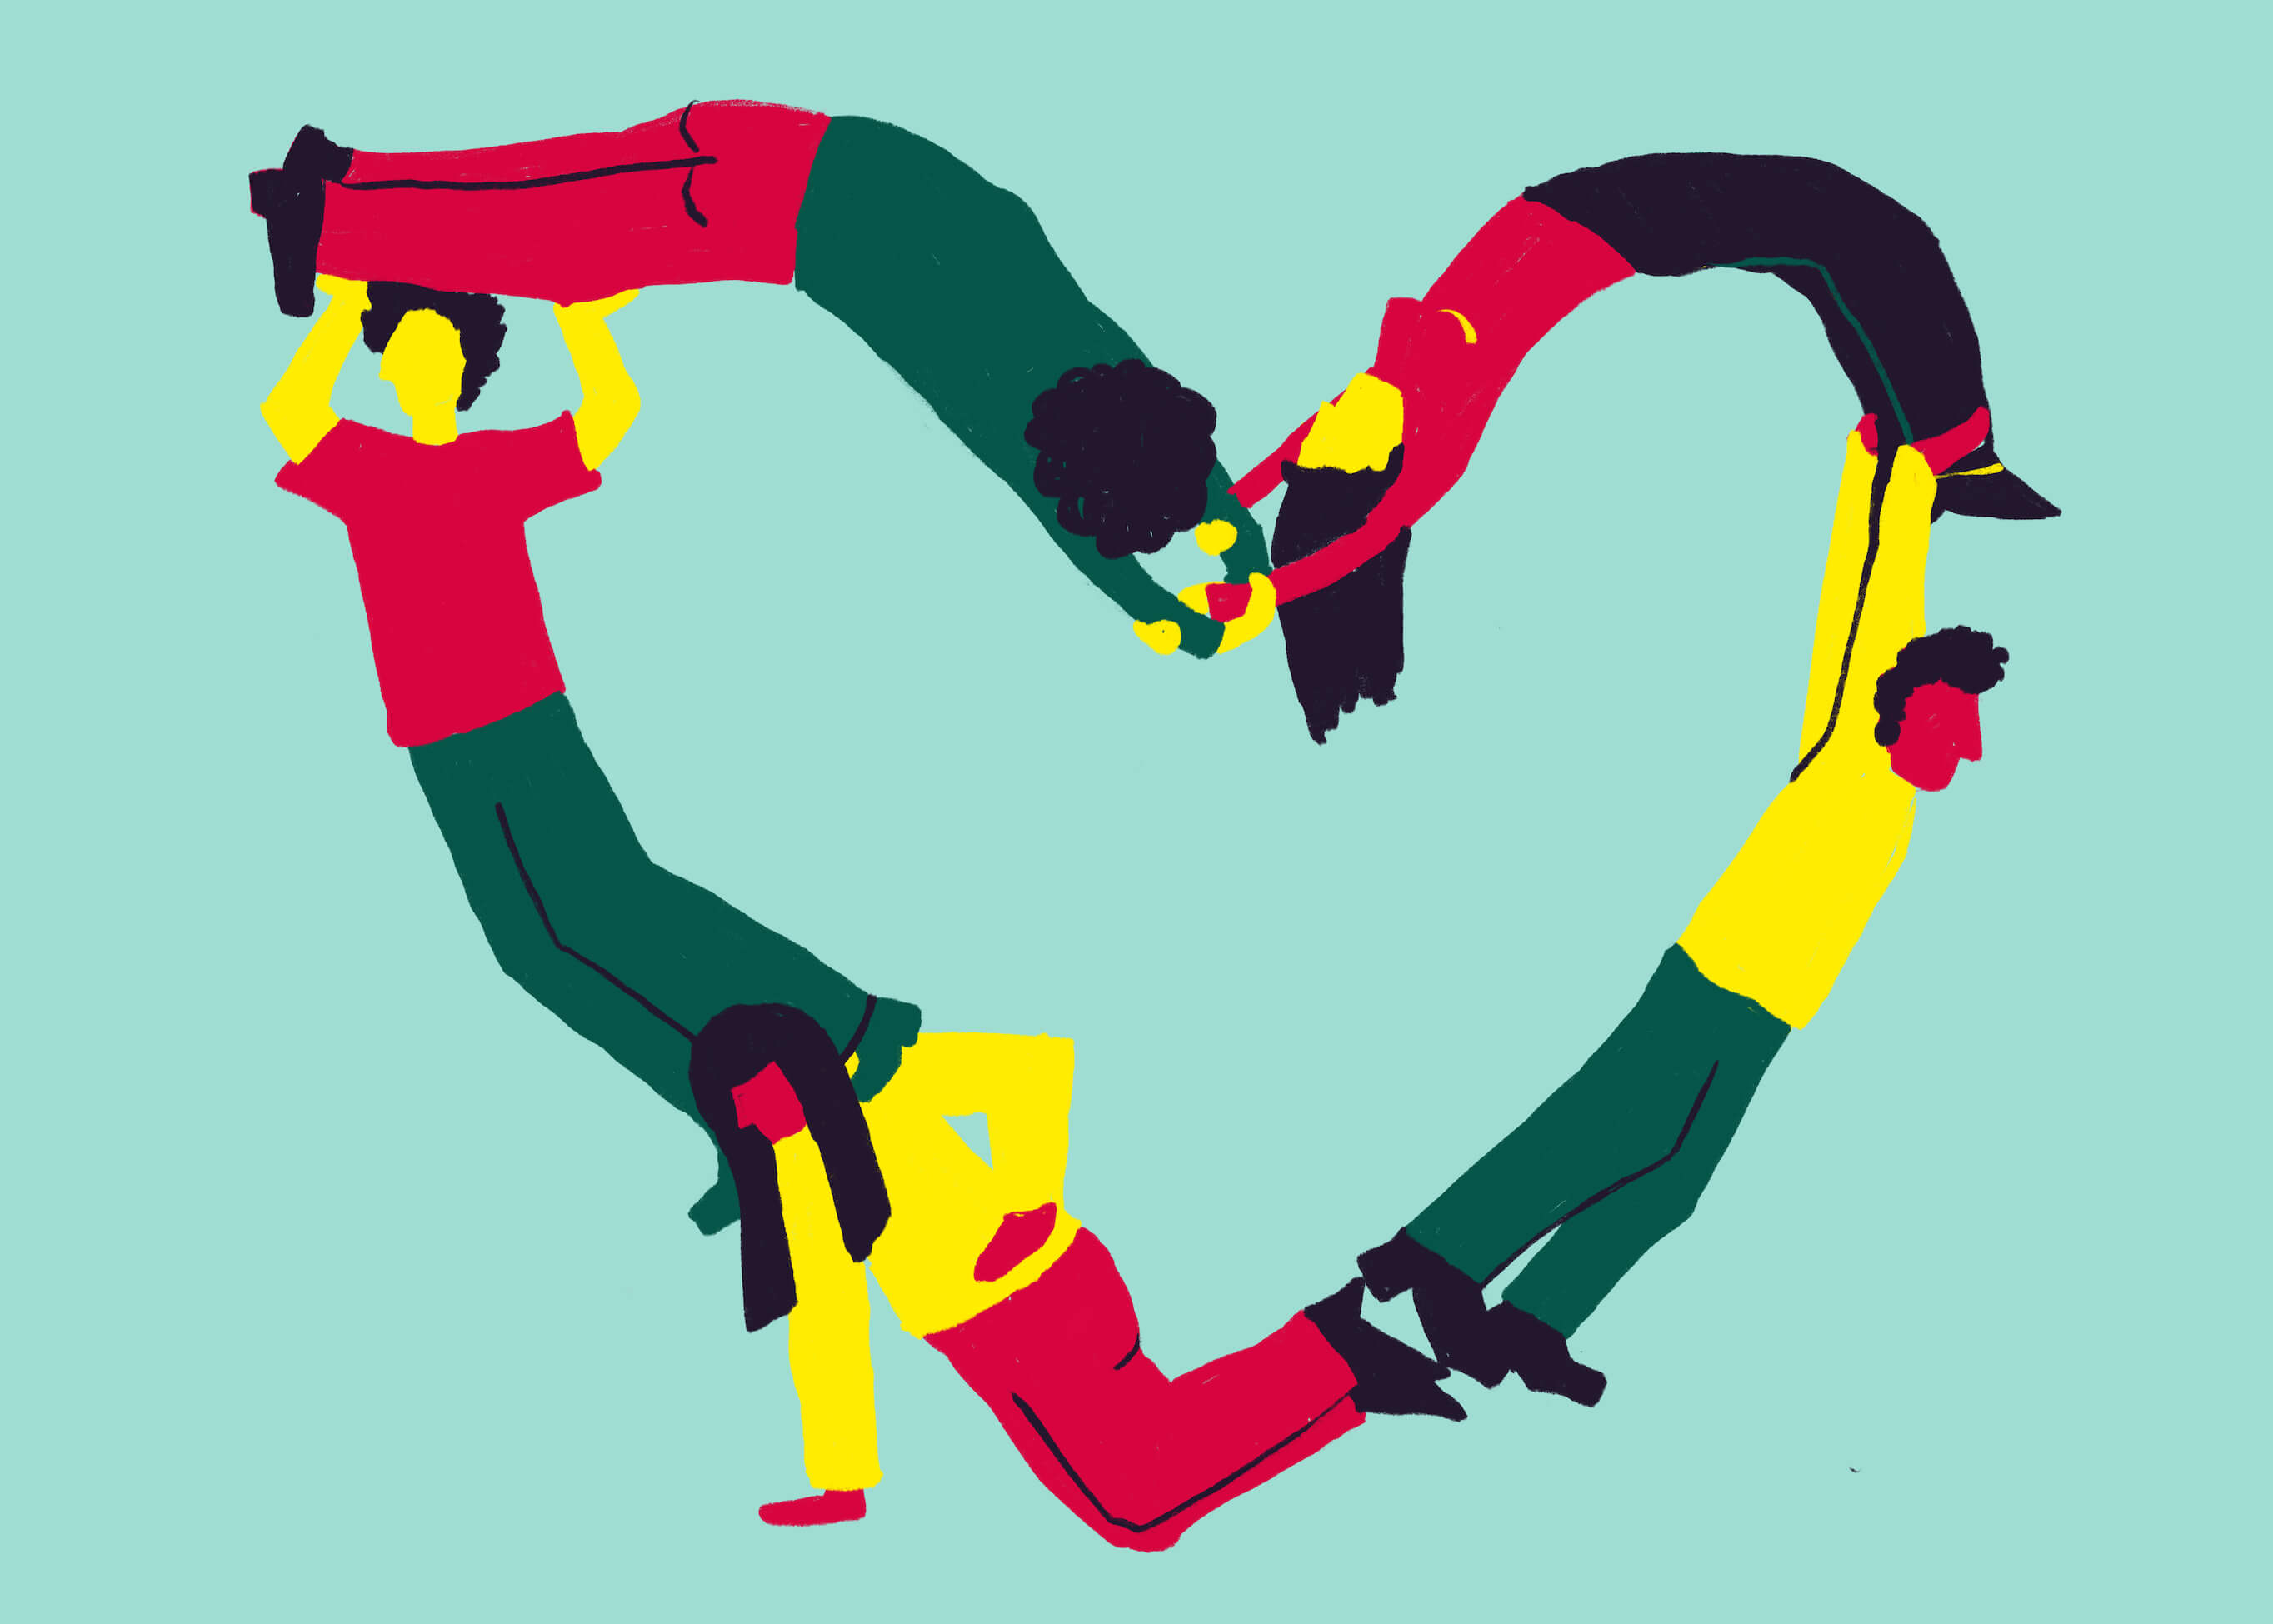 We (Heart) Solidarity main image